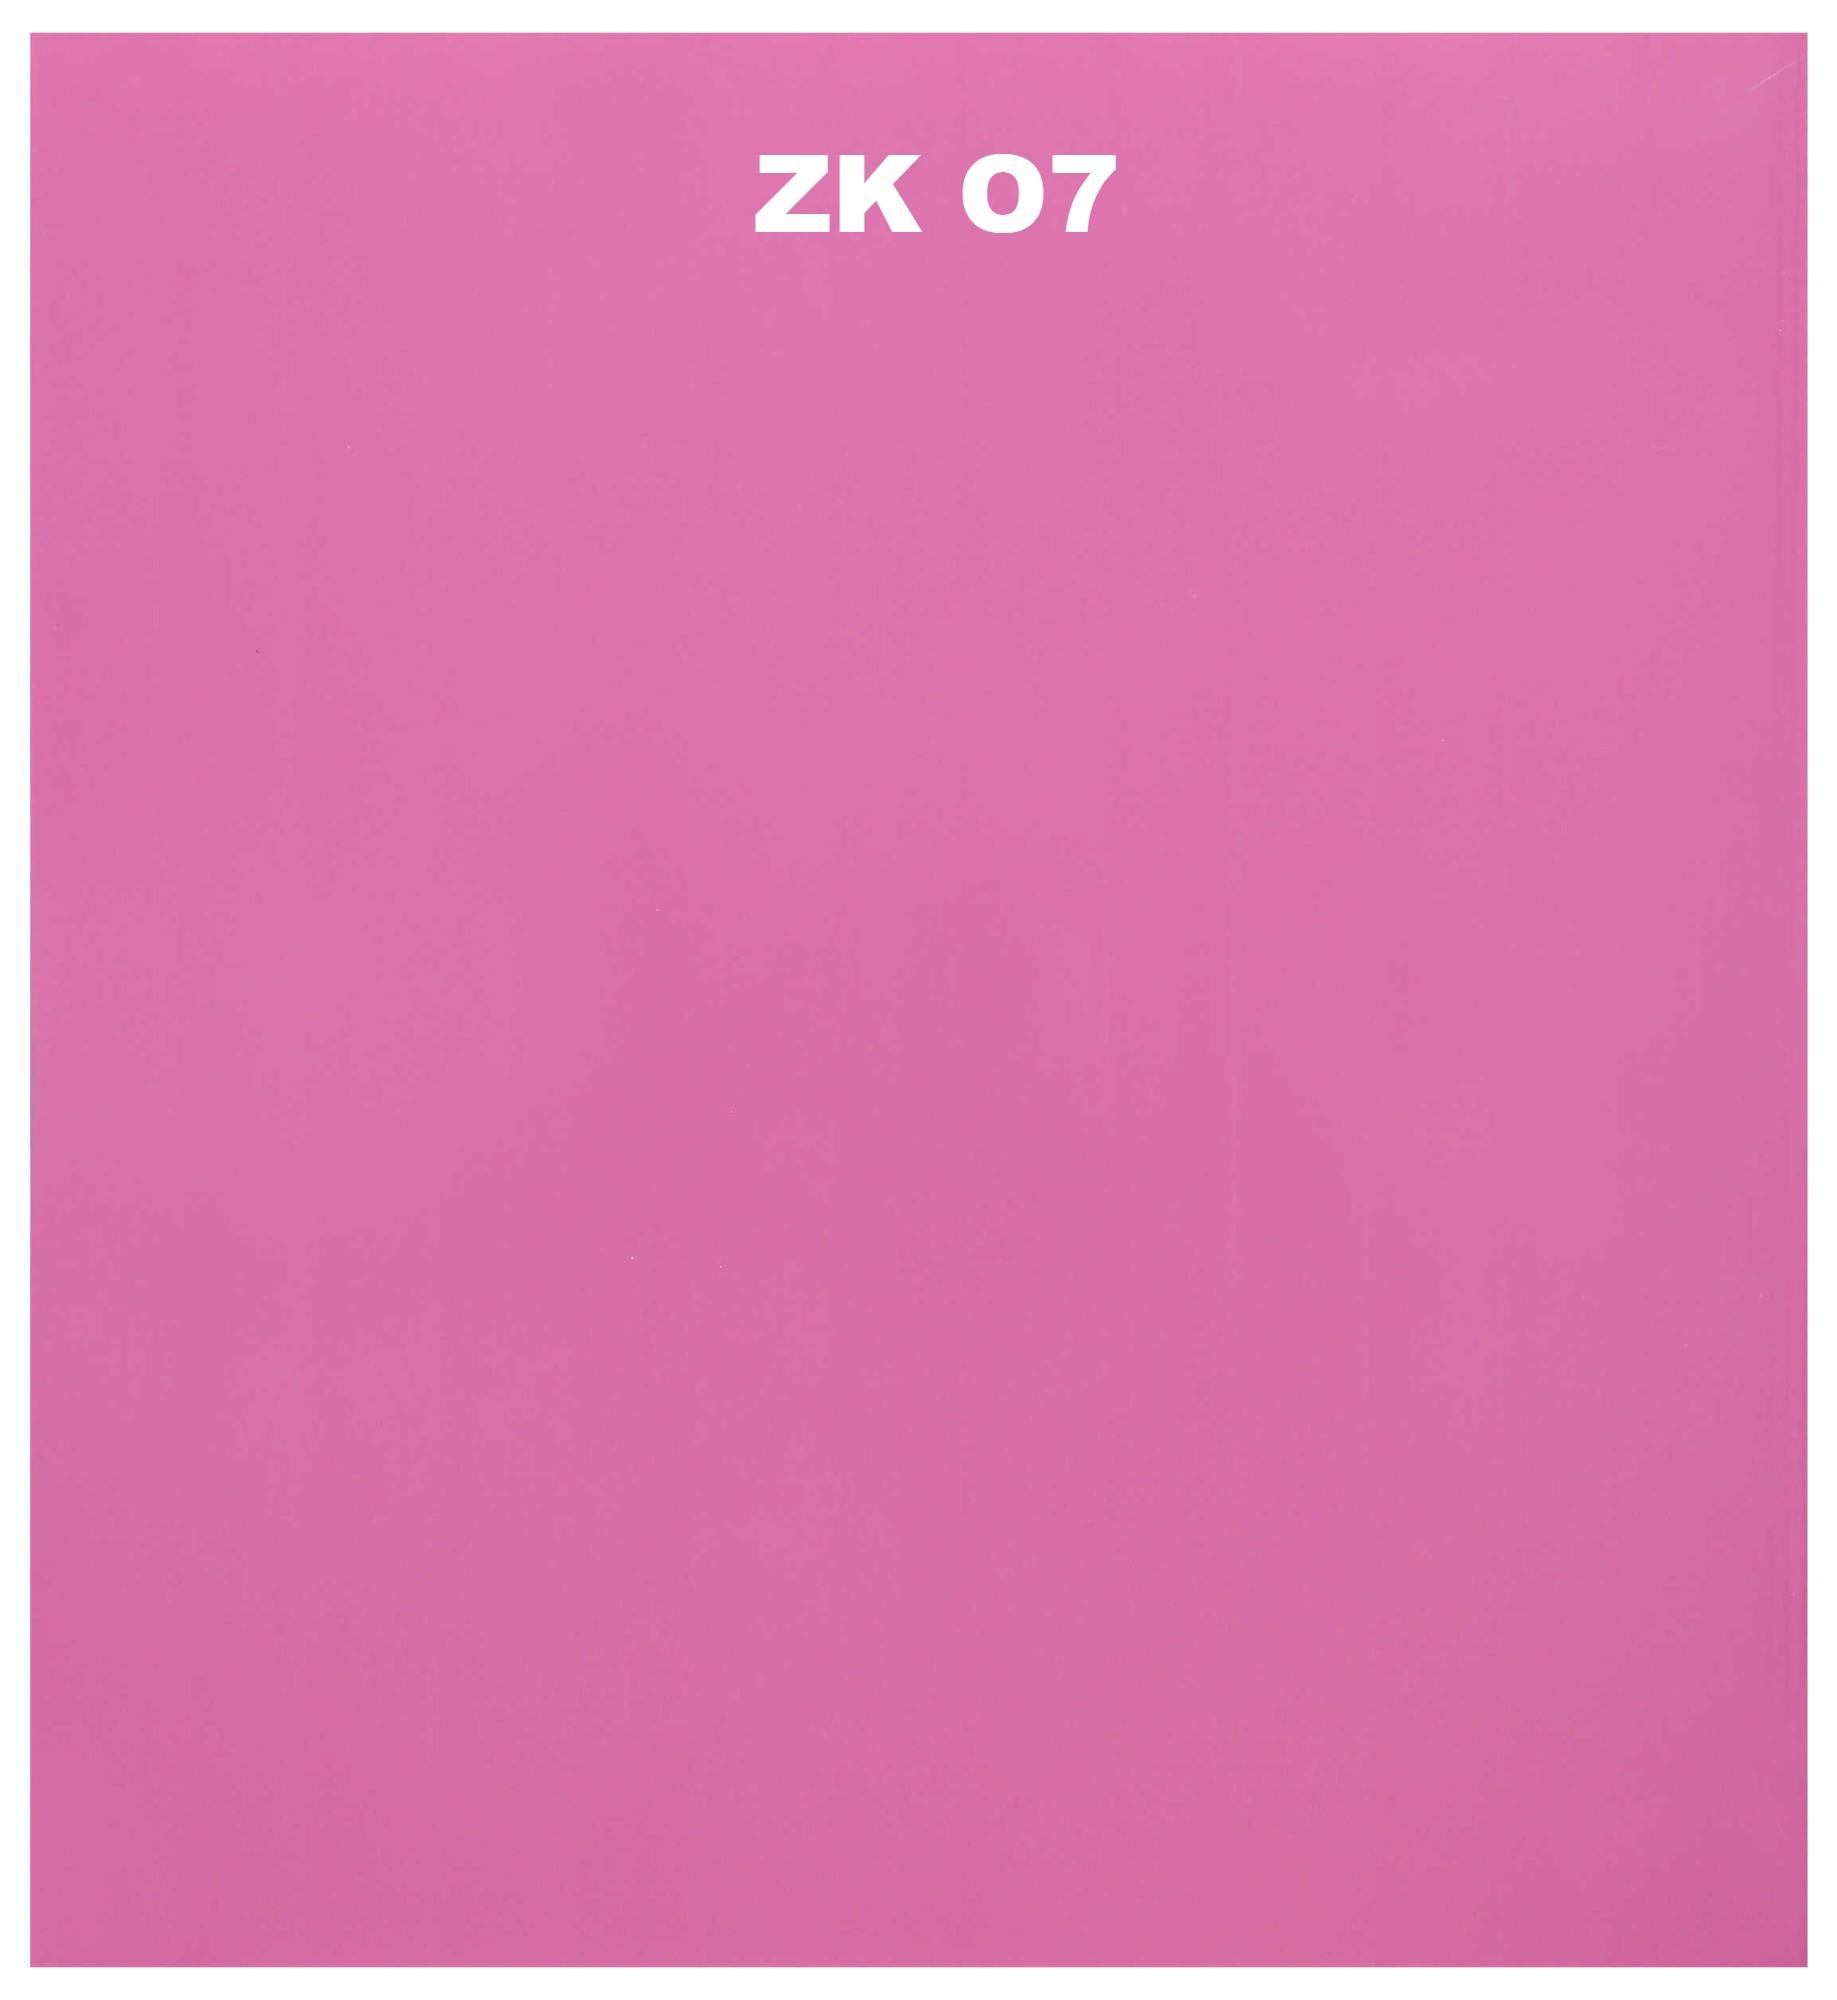 MÃ MÀU - ZK 07